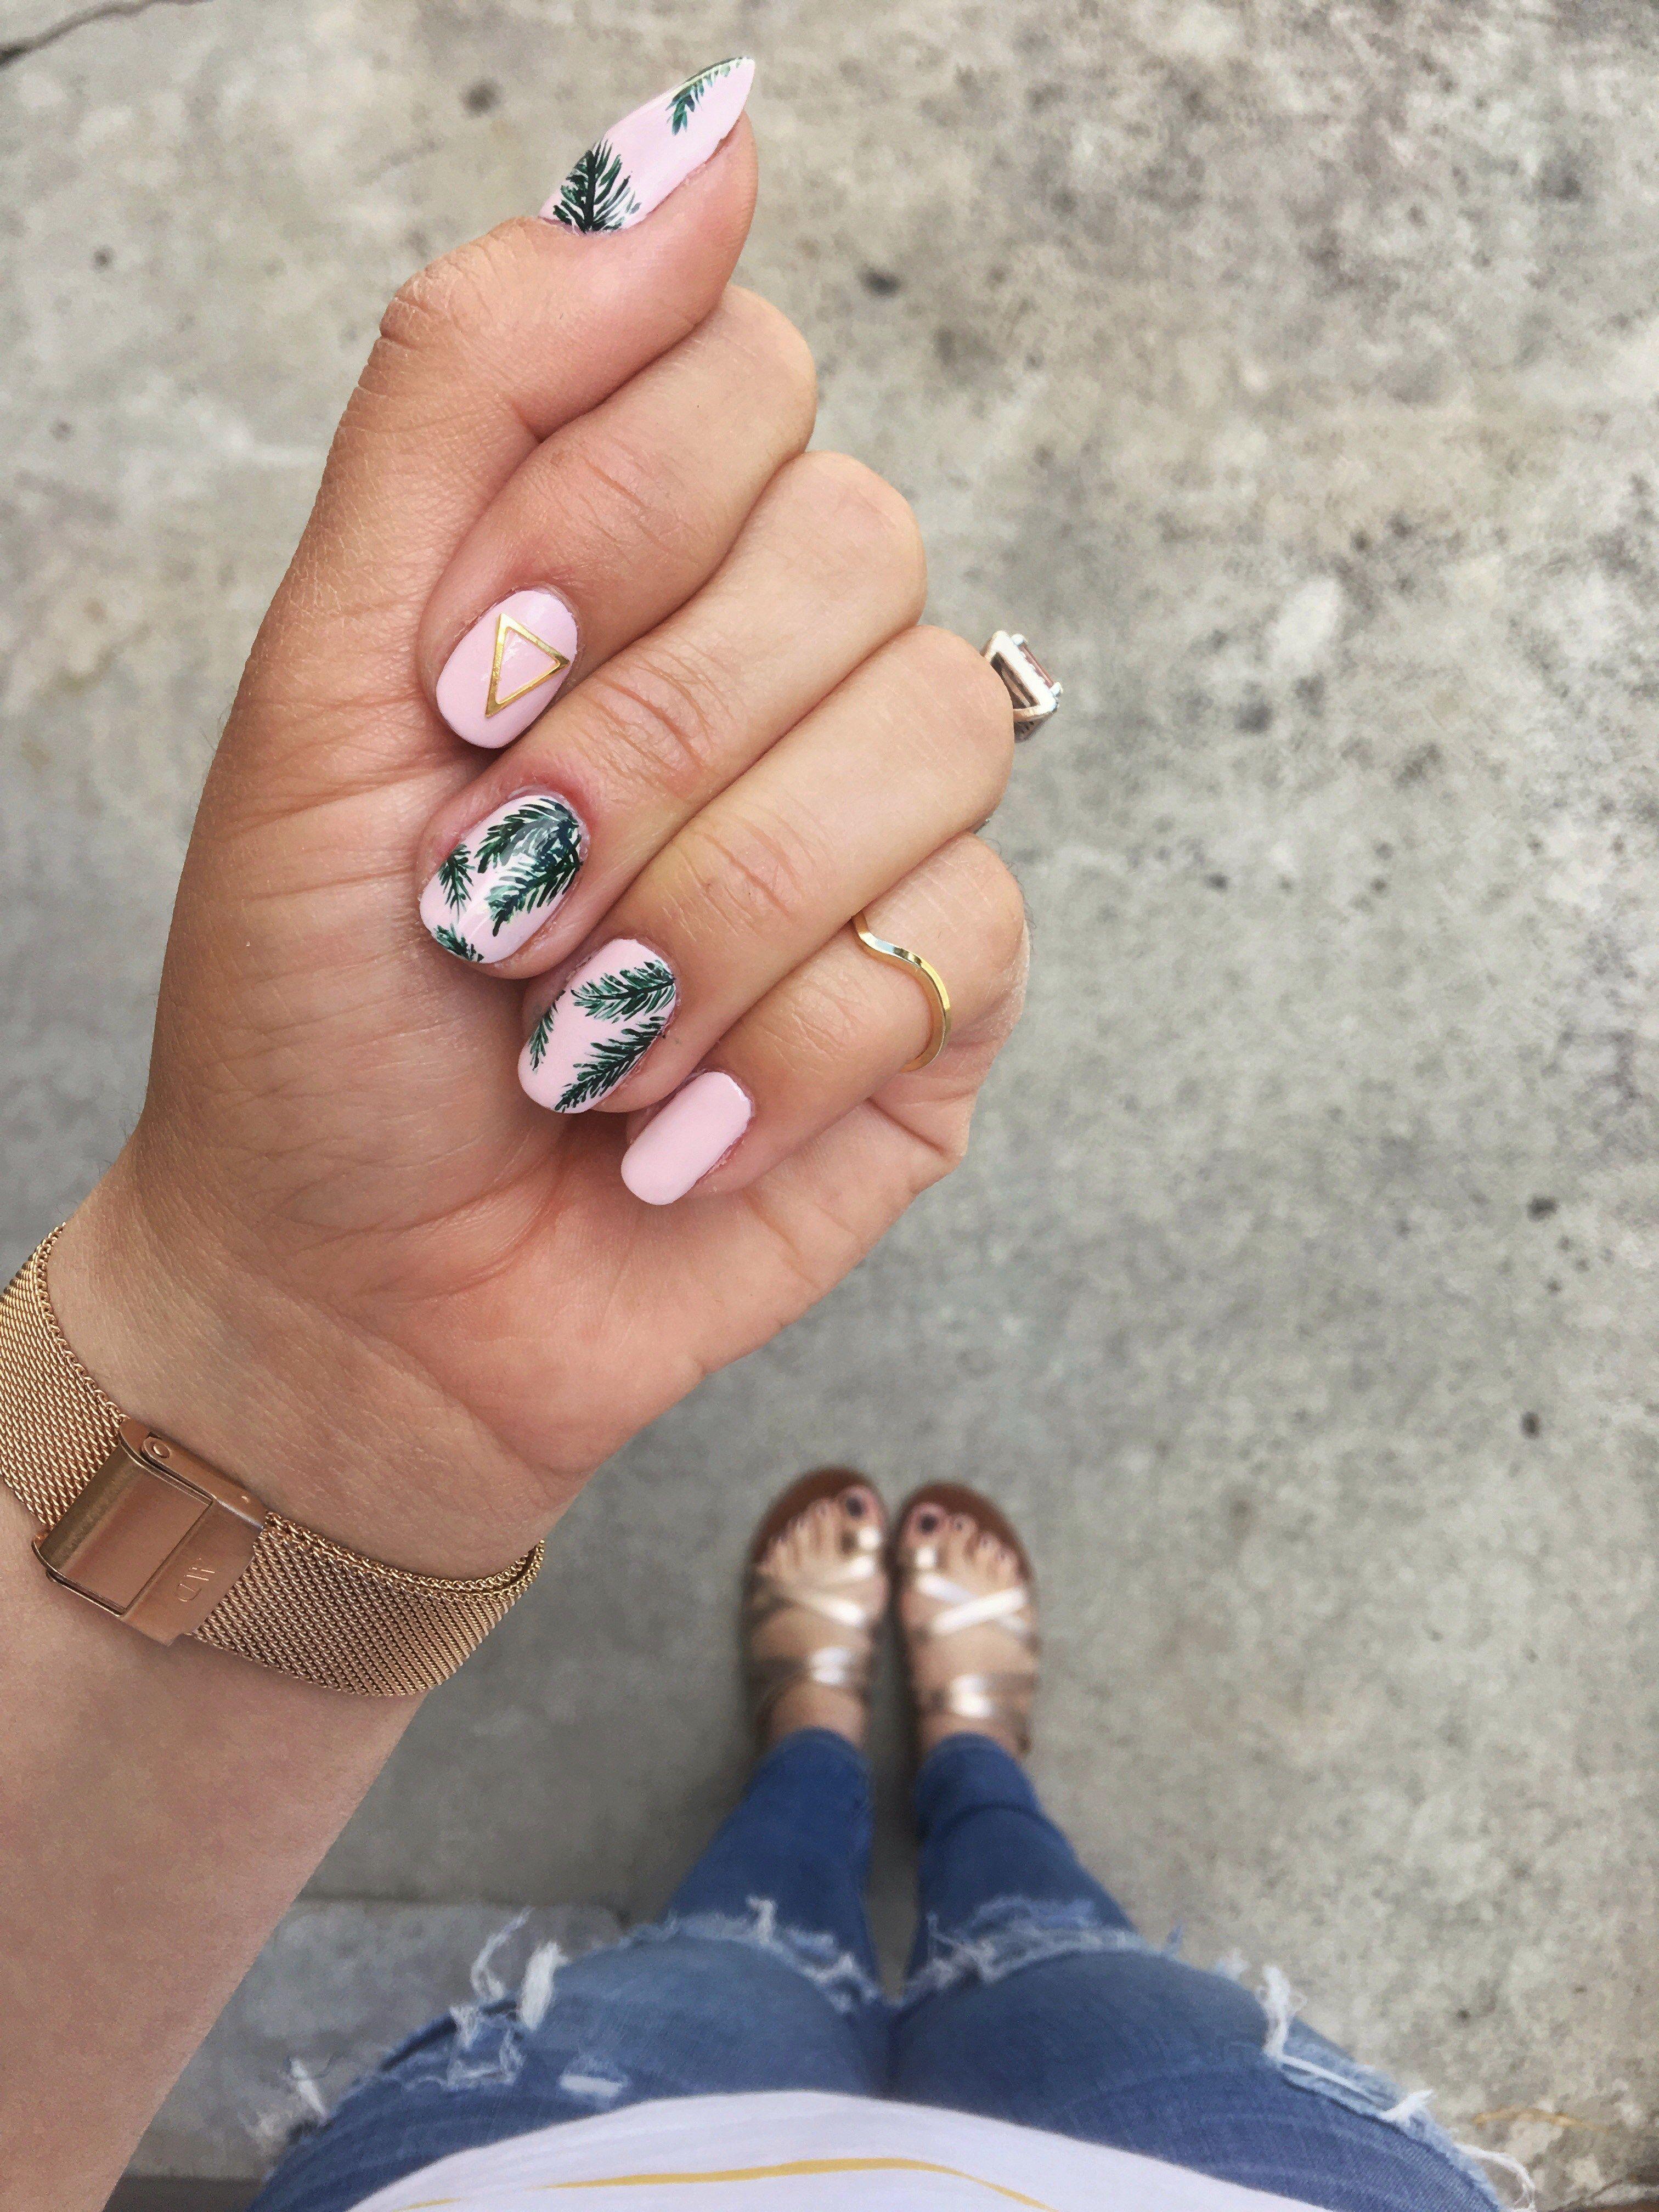 Tropical Palm Print Nail ArtBeauty Nail Art essie julep nail art ...